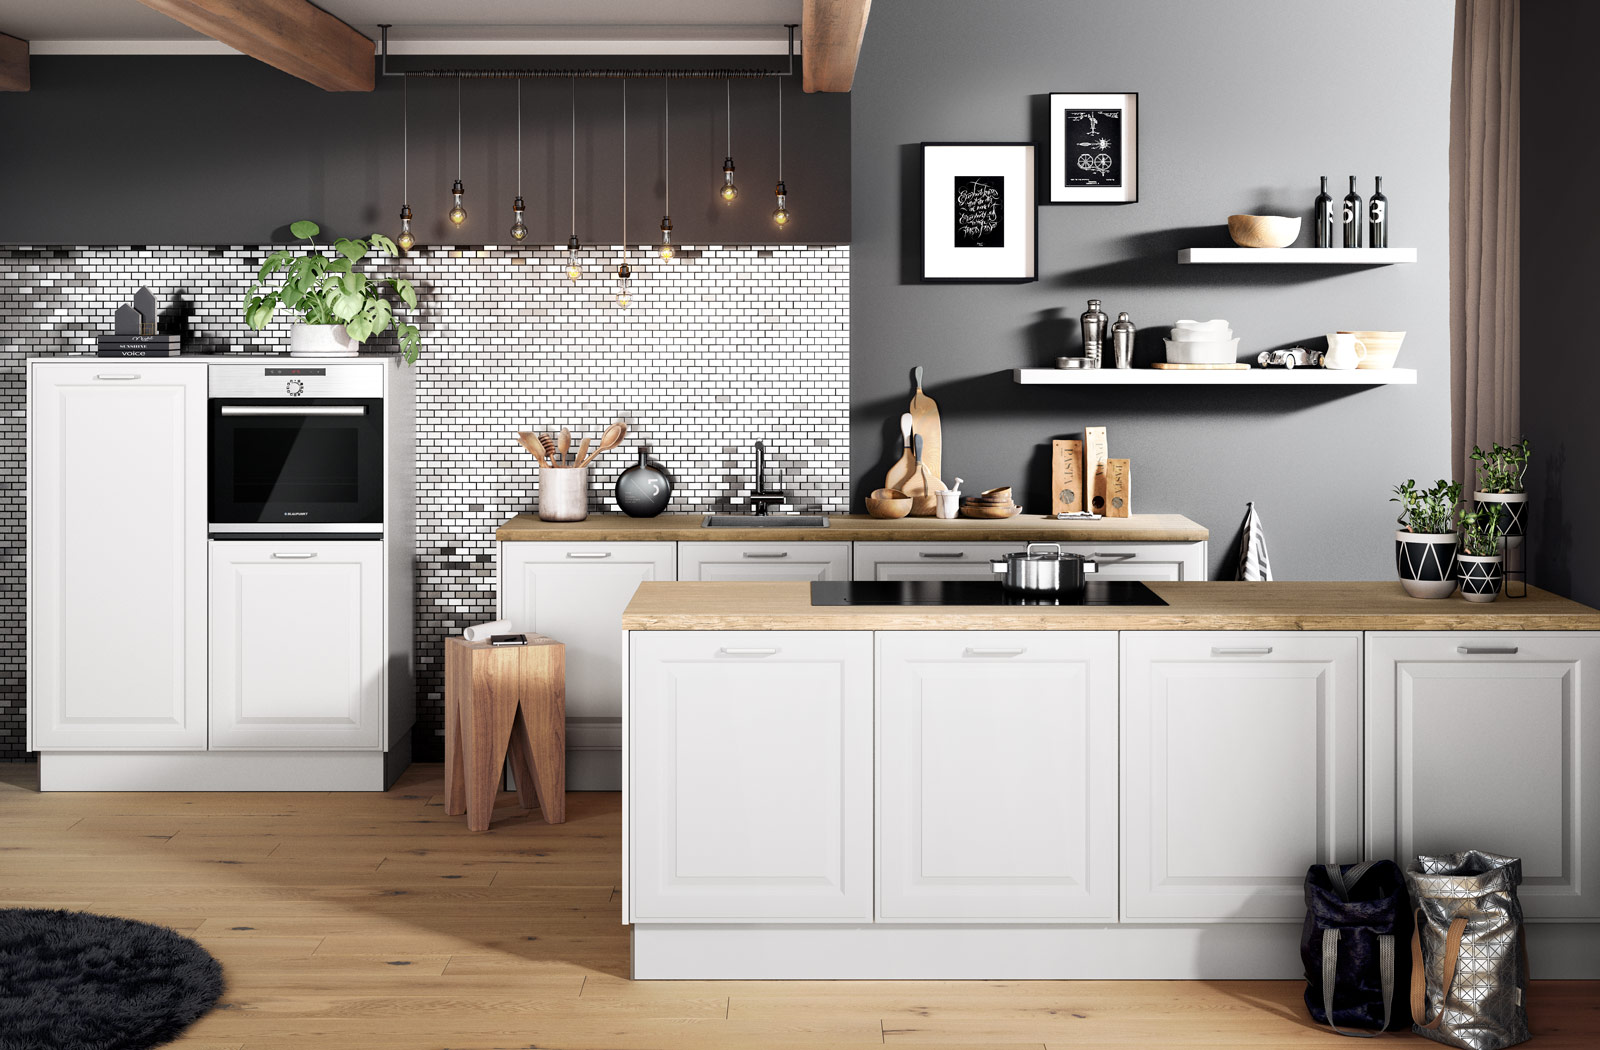 White Keuken Stoere : Keukenstudio stoof landelijke keukens stoer en robuust